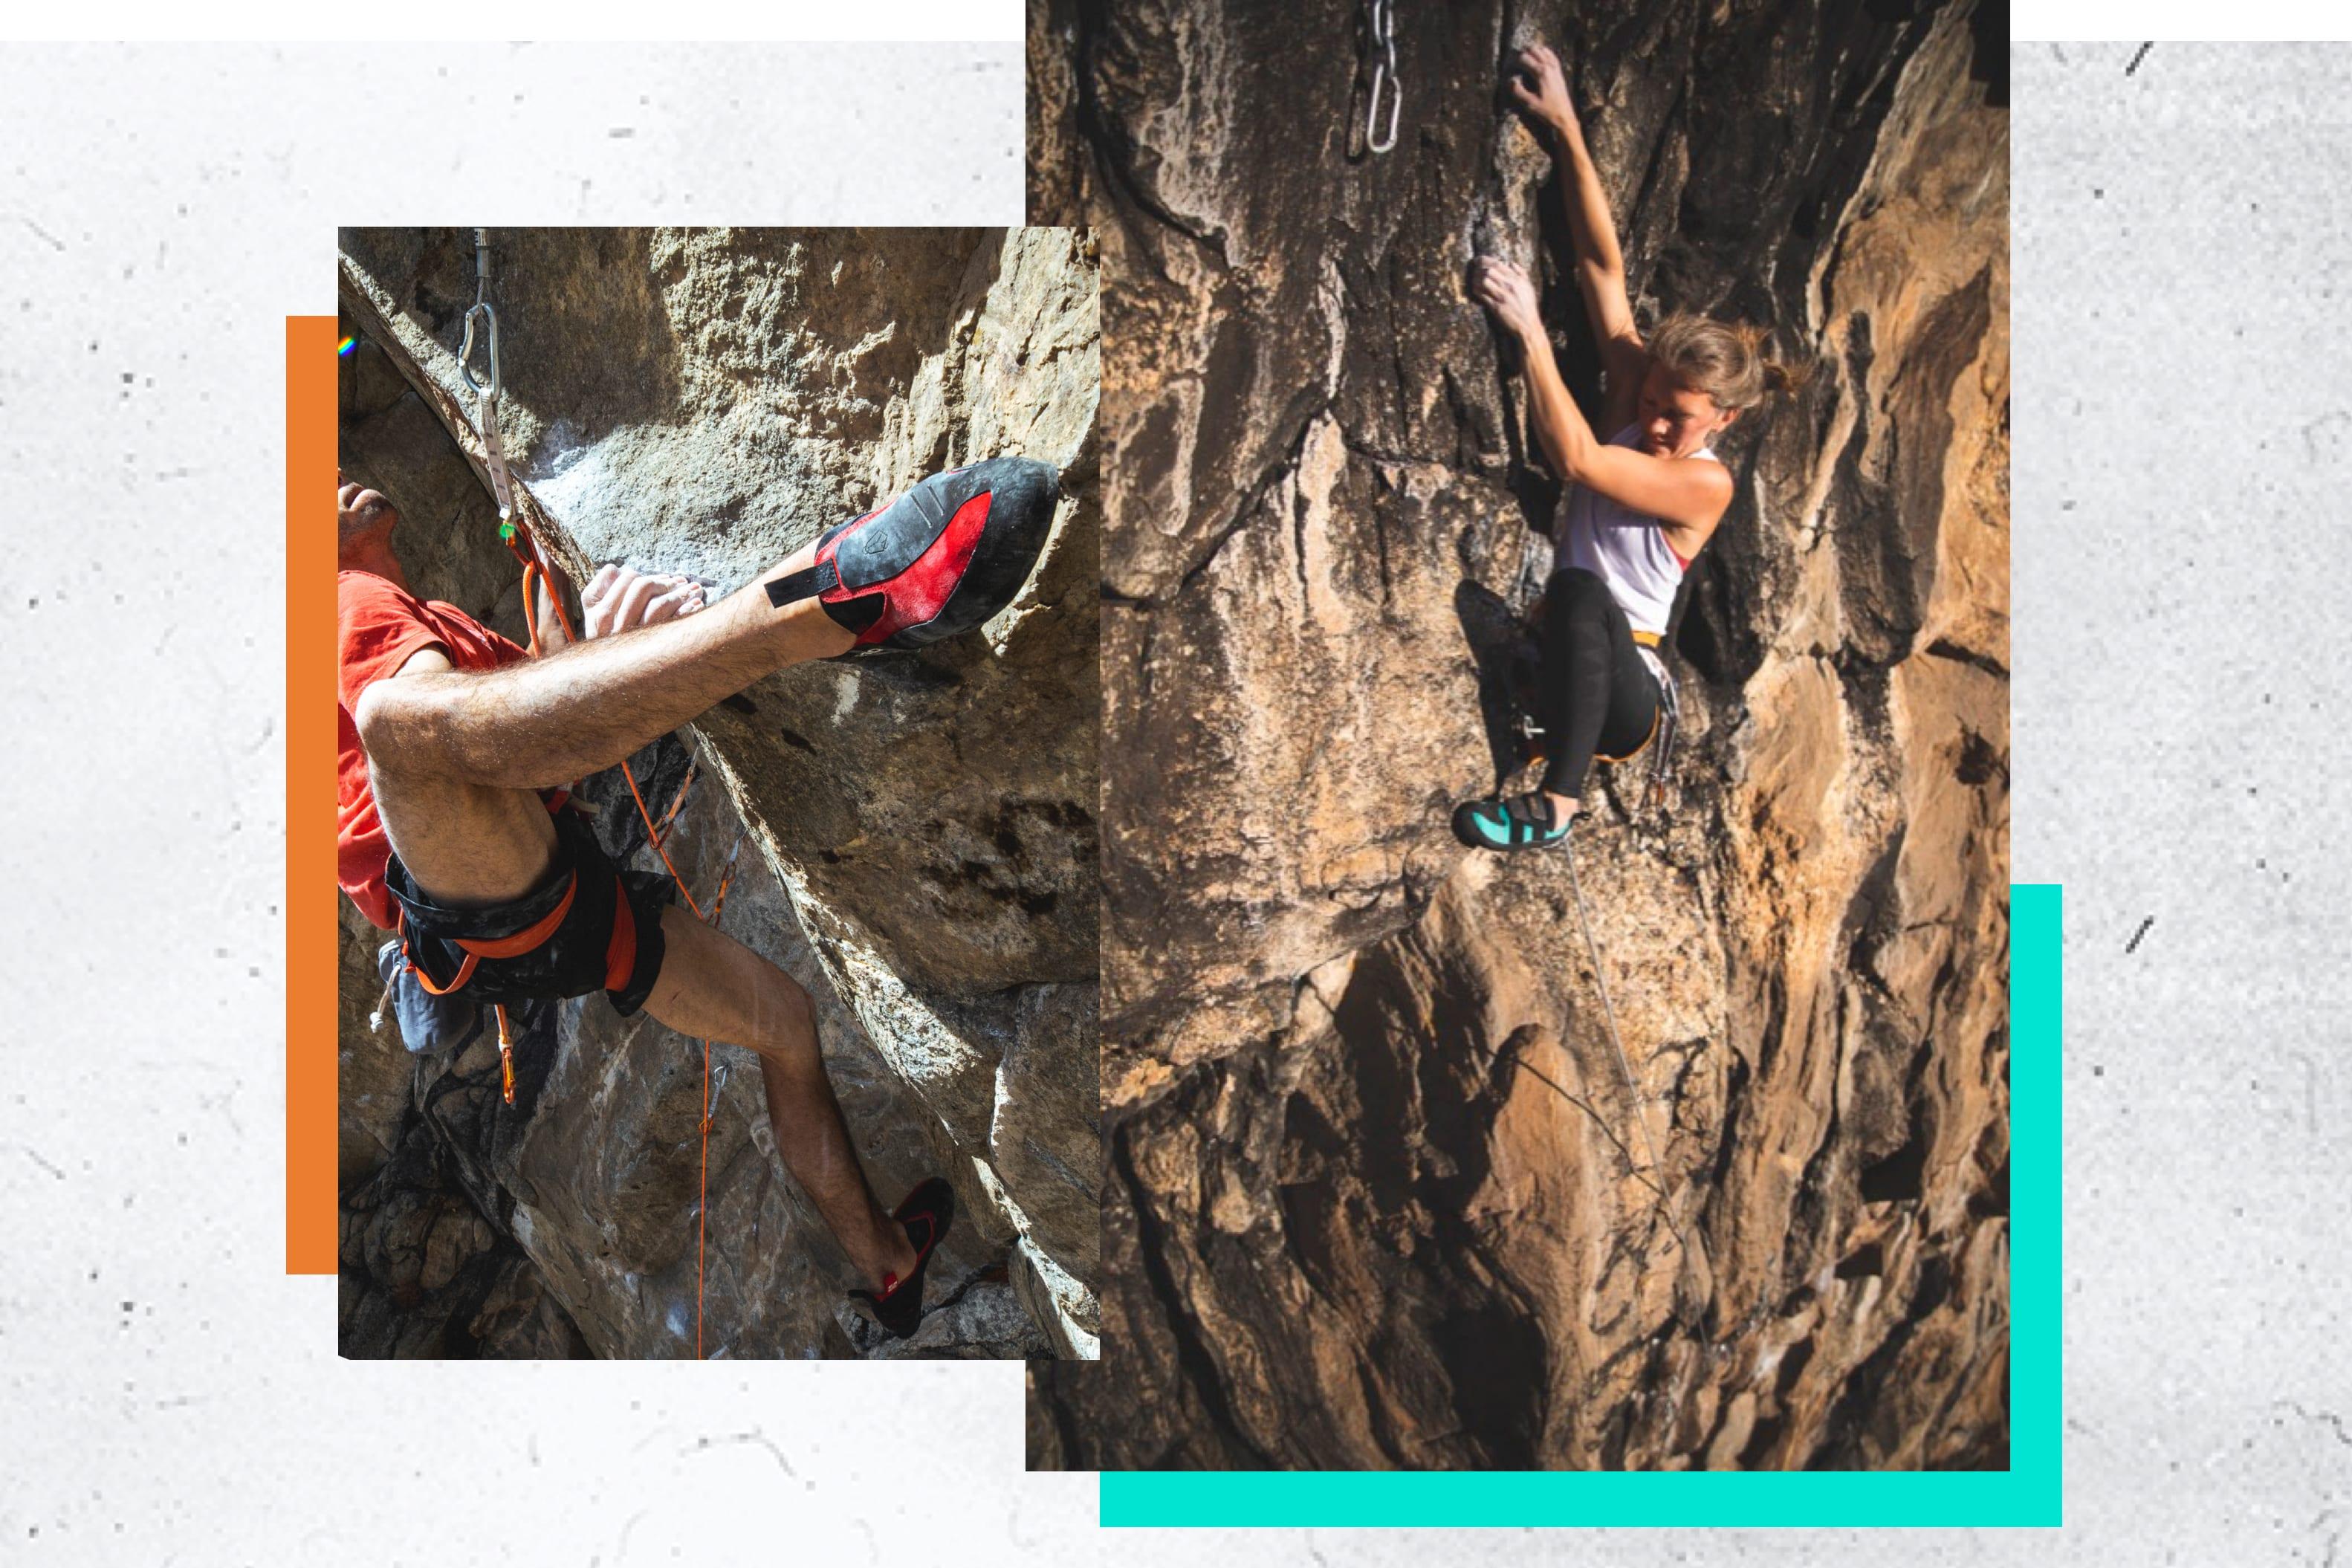 outdoor-ss21-beginclimb-BlogPage3-image3-img